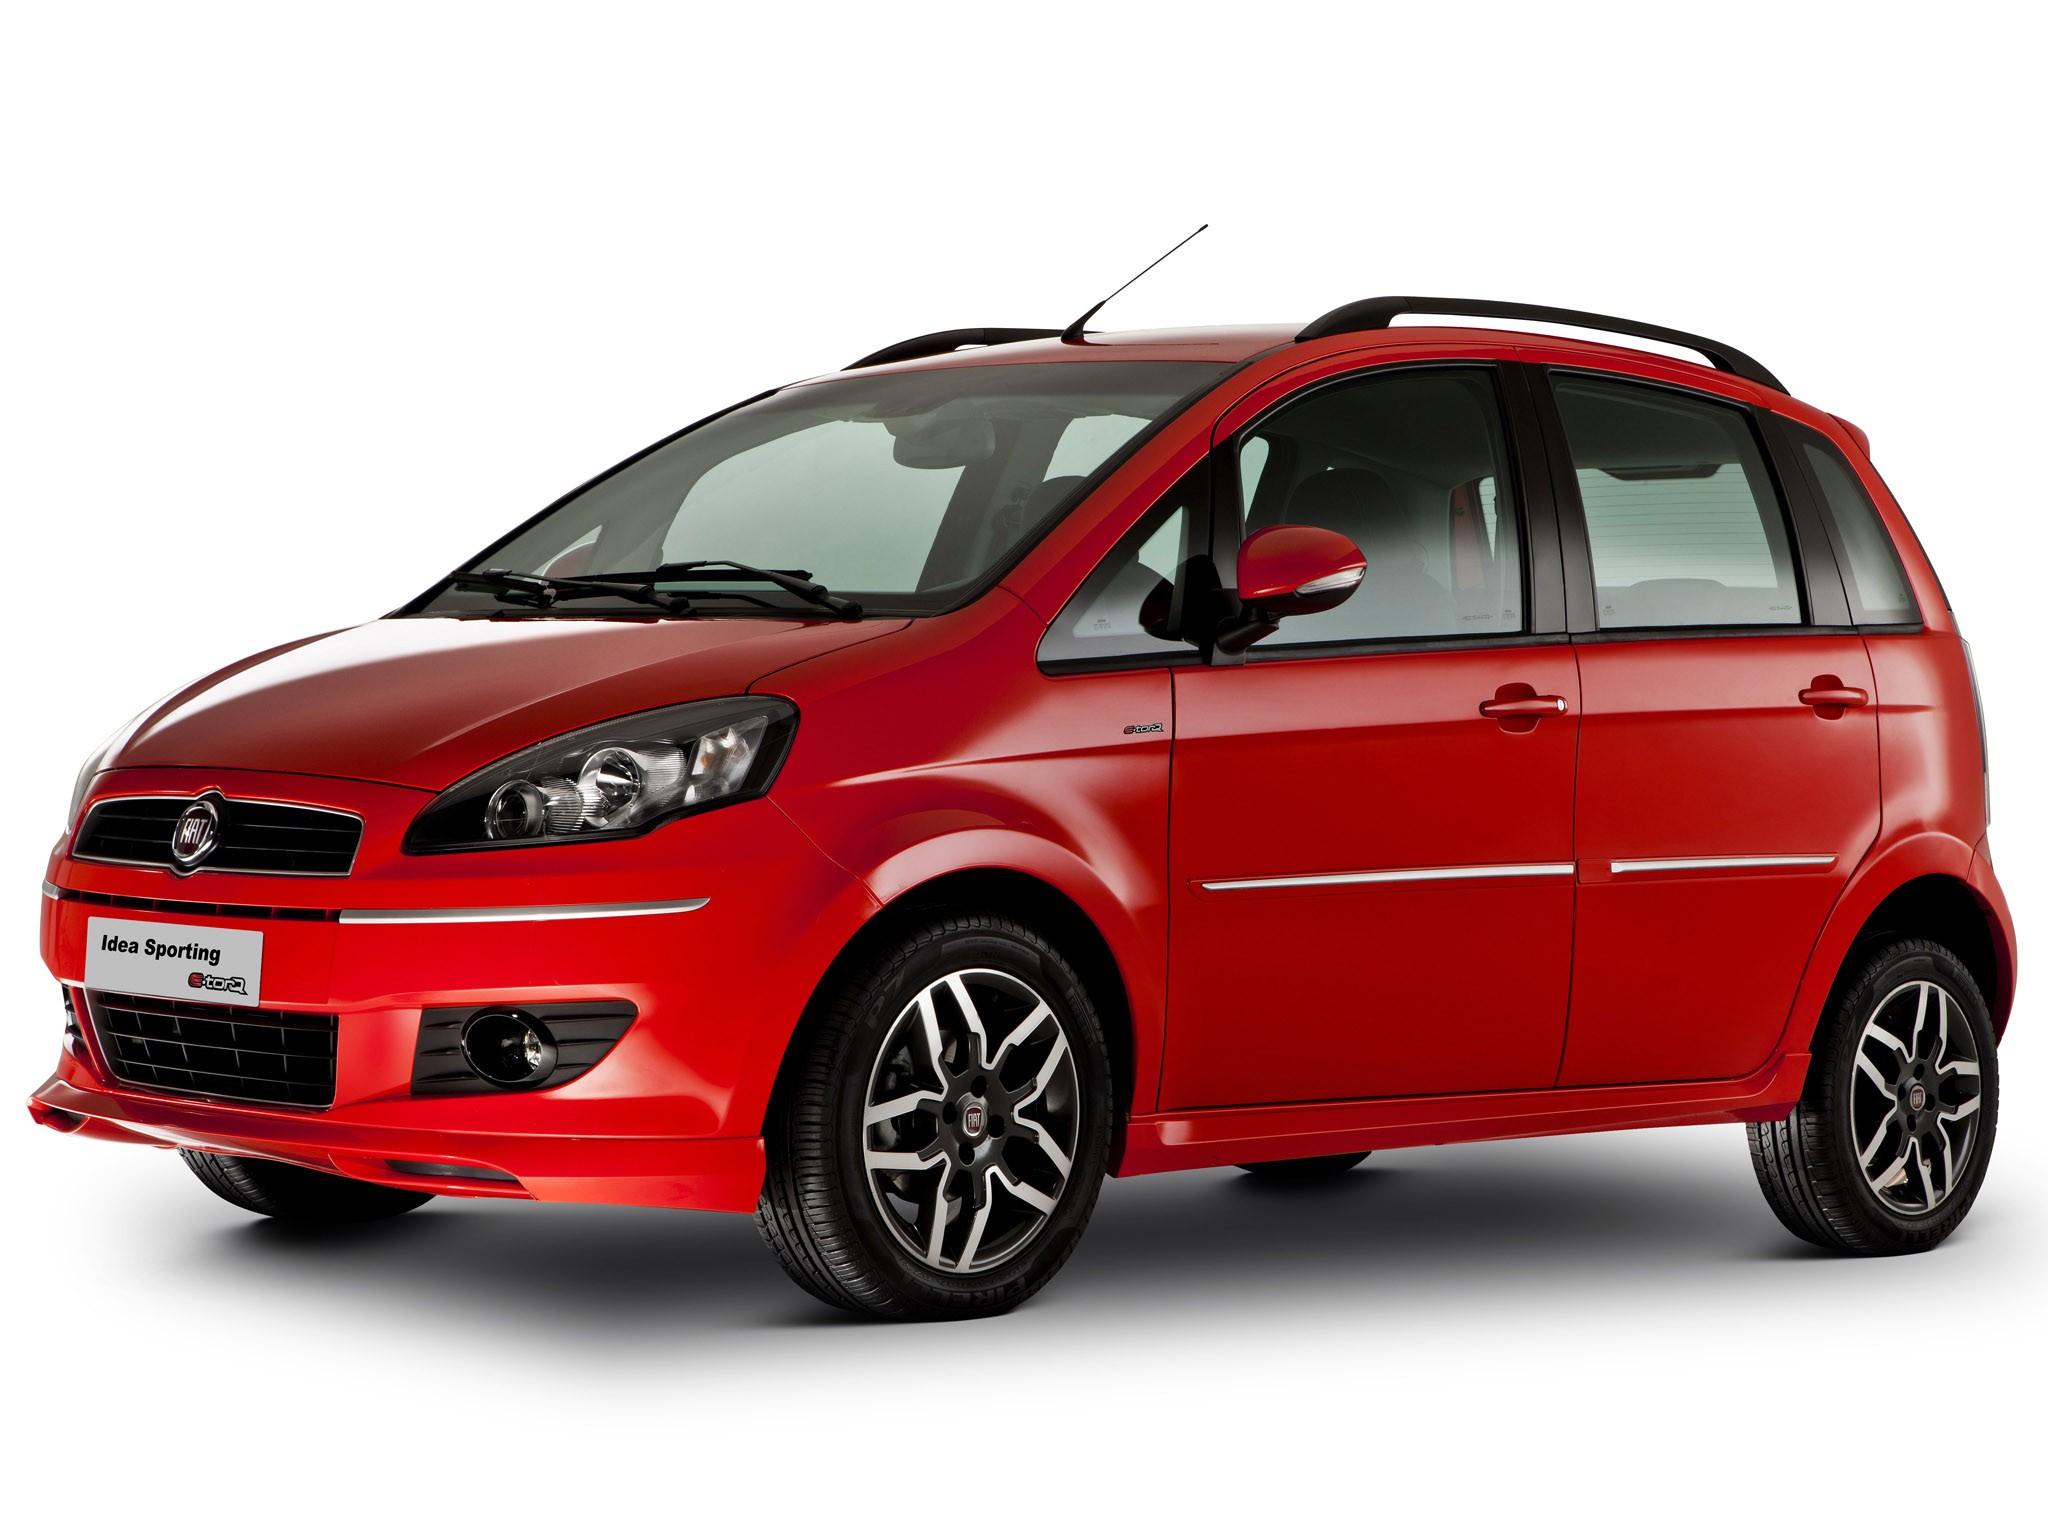 2010 Fiat Idea Sporting